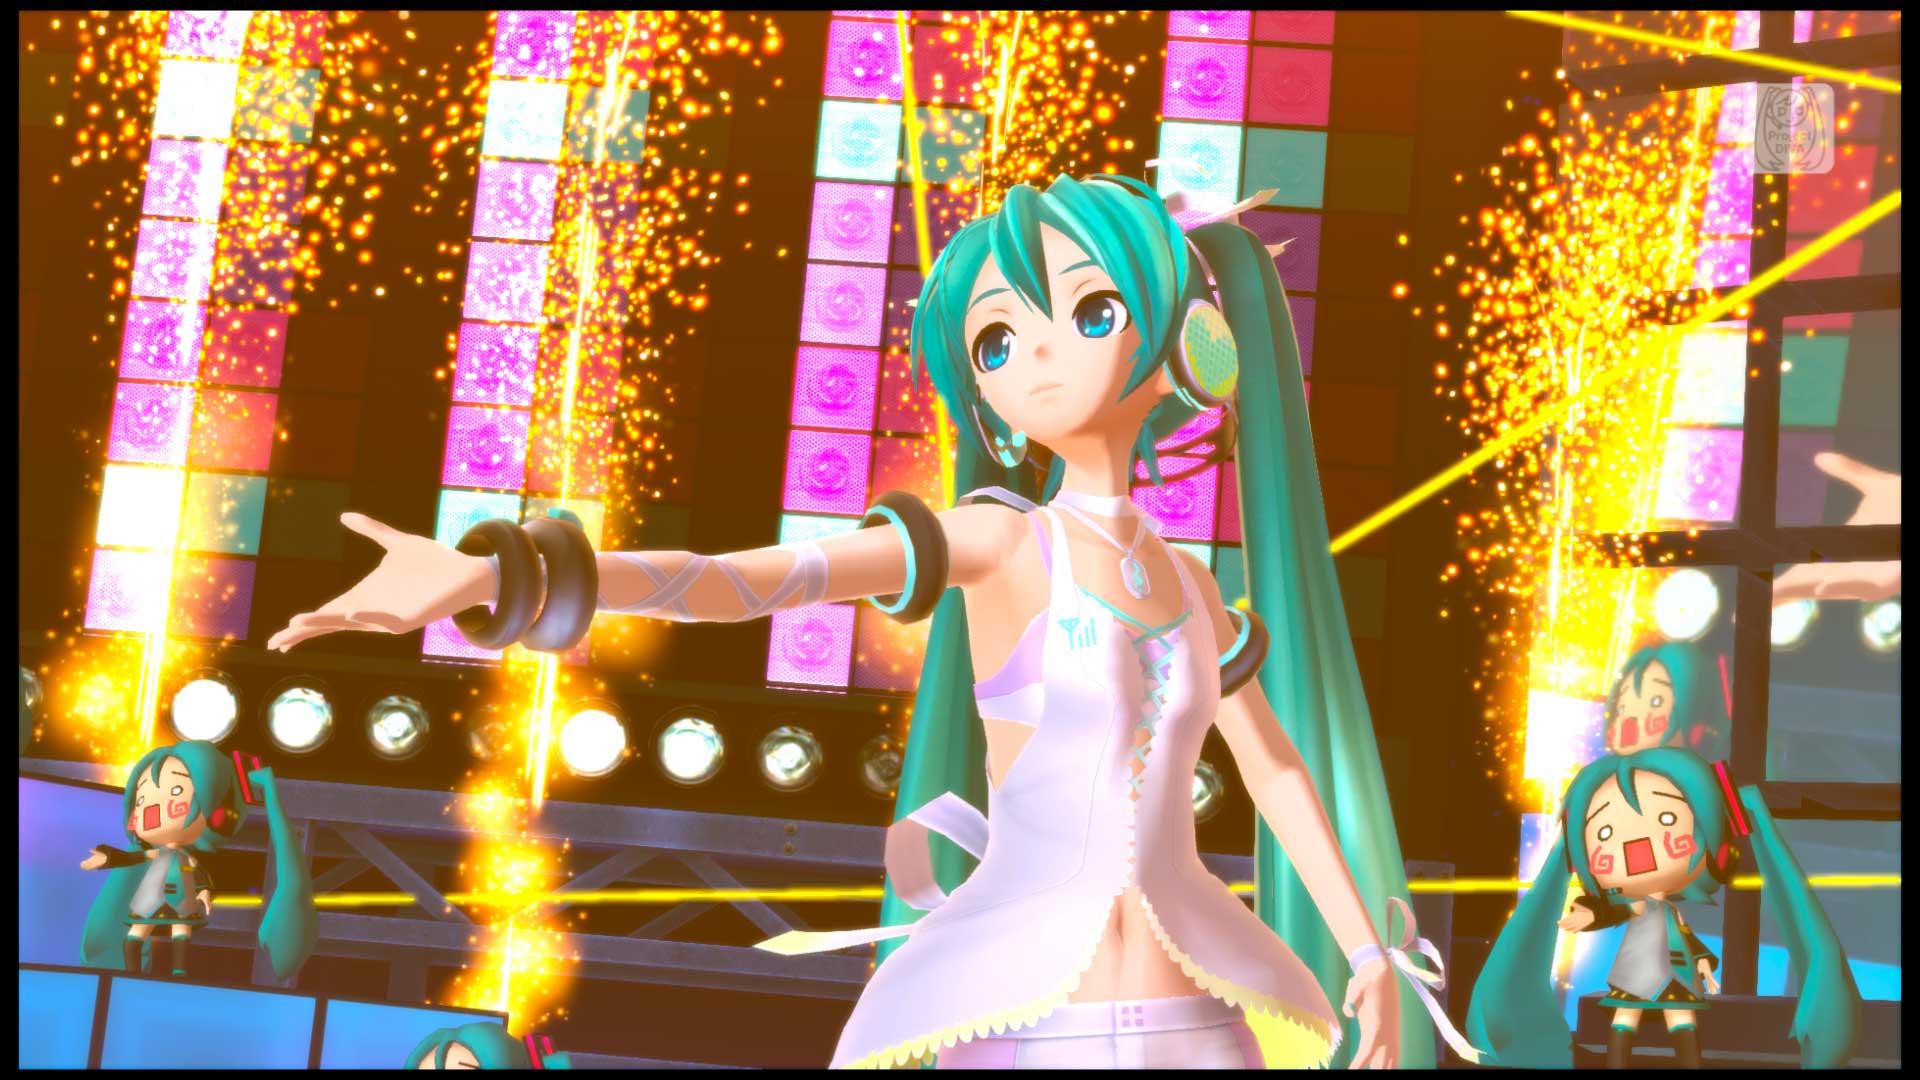 HatsuneMikuDIVAF2nd_Addon_mikucute_PS3_SS1_1425409298